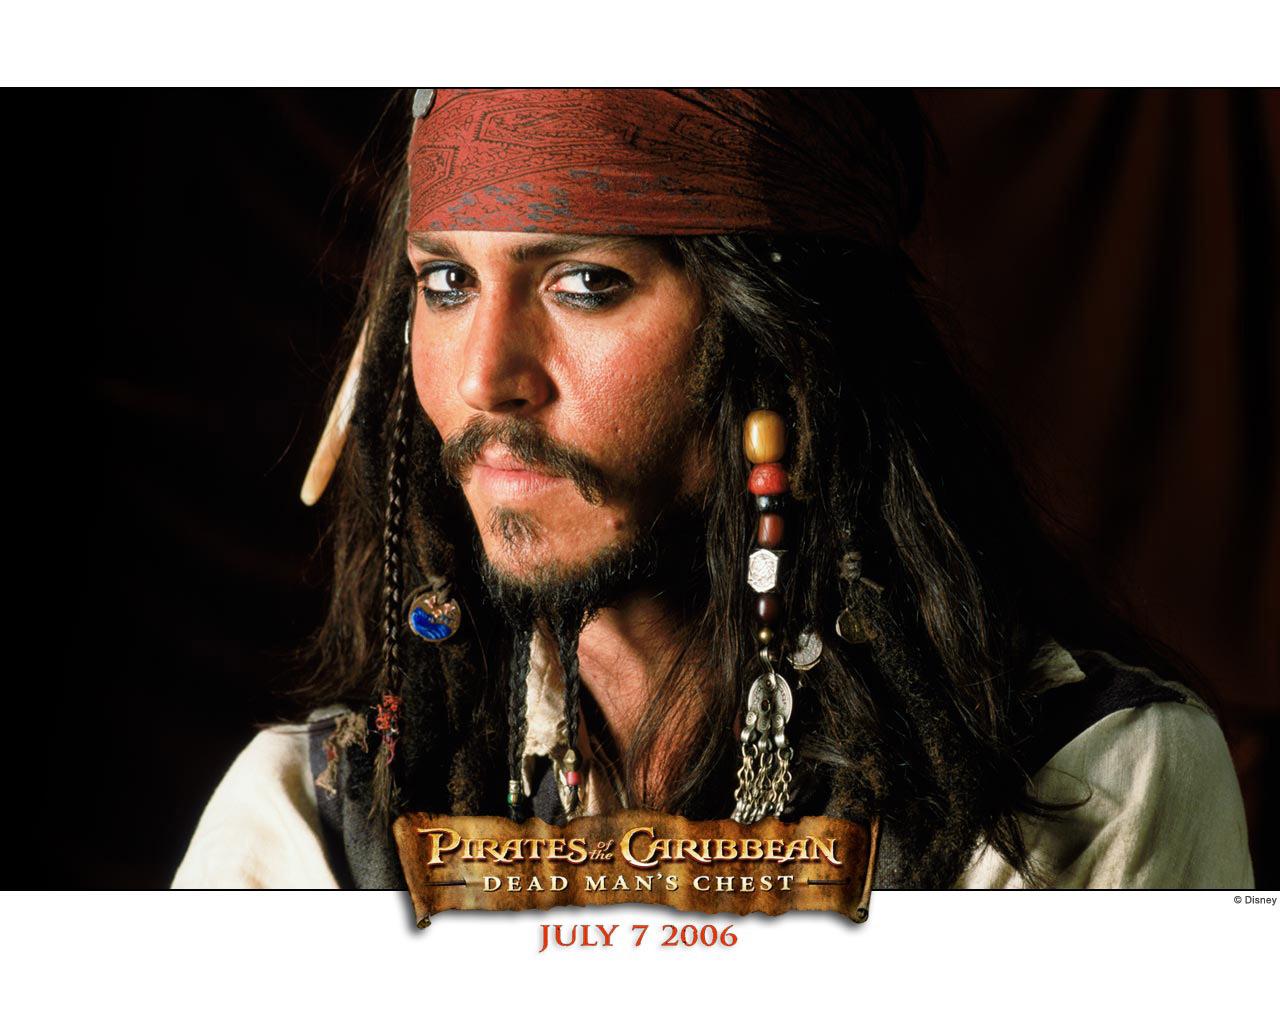 http://1.bp.blogspot.com/_e08tXXFmPM8/TShr41XVI7I/AAAAAAAAAac/khQzdEz1LWg/s1600/Jack-Sparrow-pirates-of-the-caribbean-35030_1280_1024.jpg